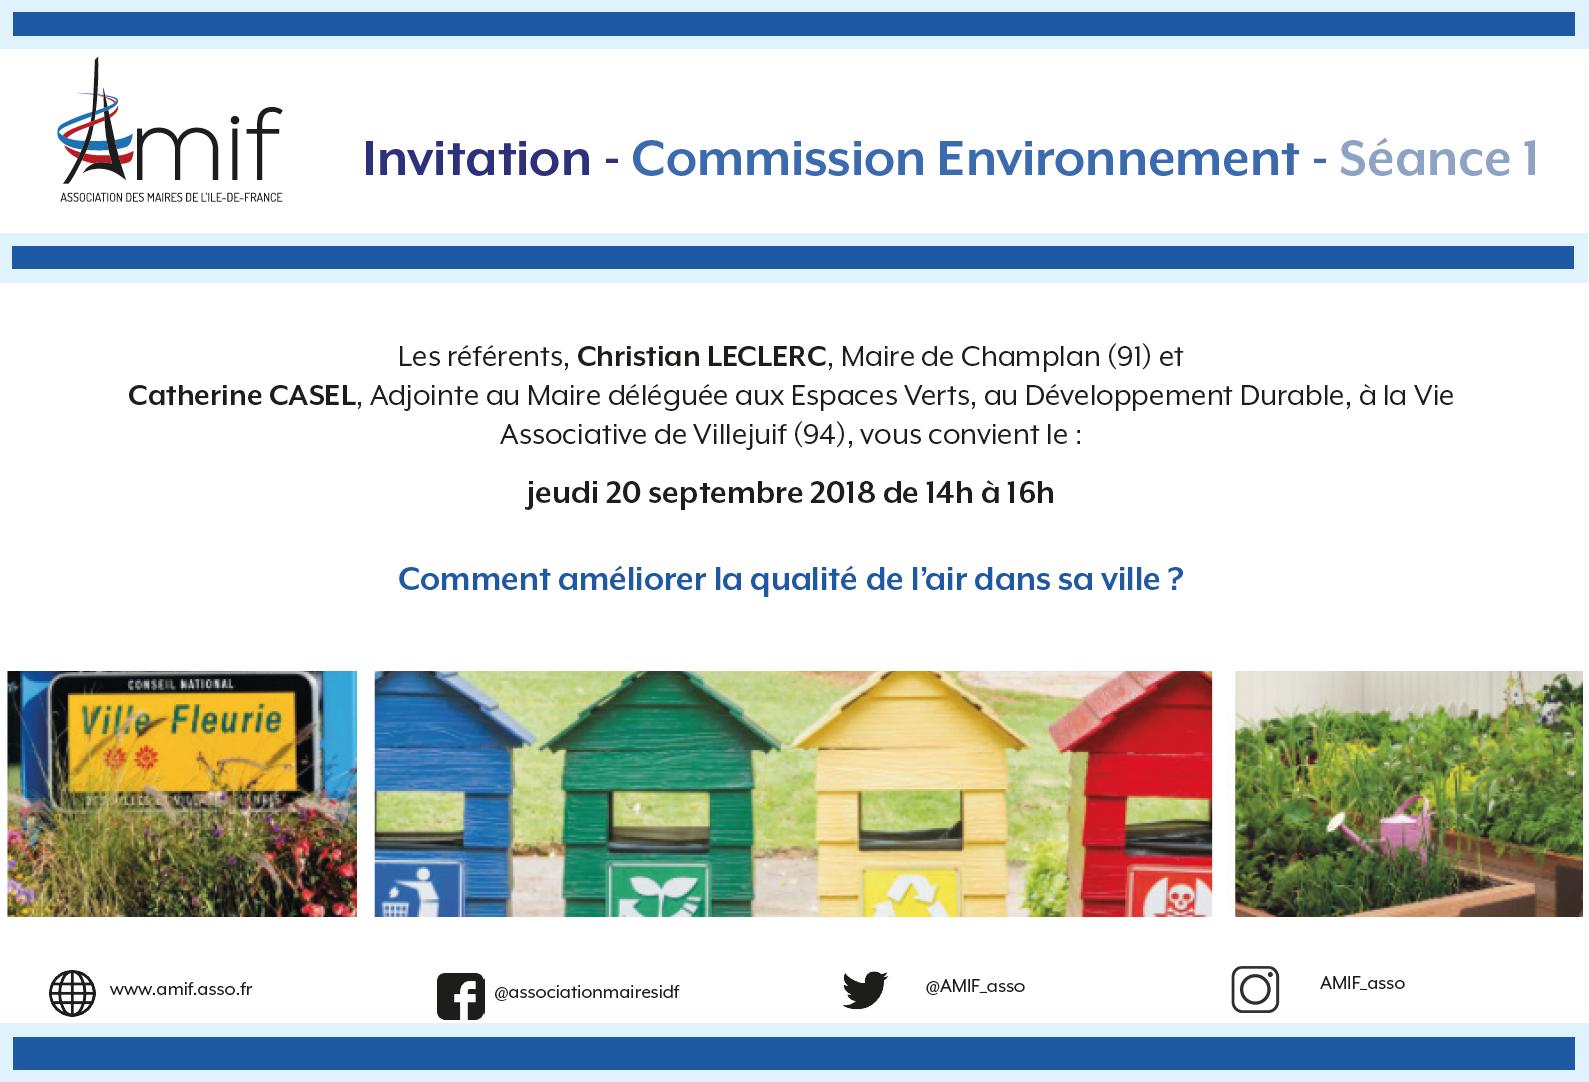 CommissionEnvironnementSeance120septembre2018v2